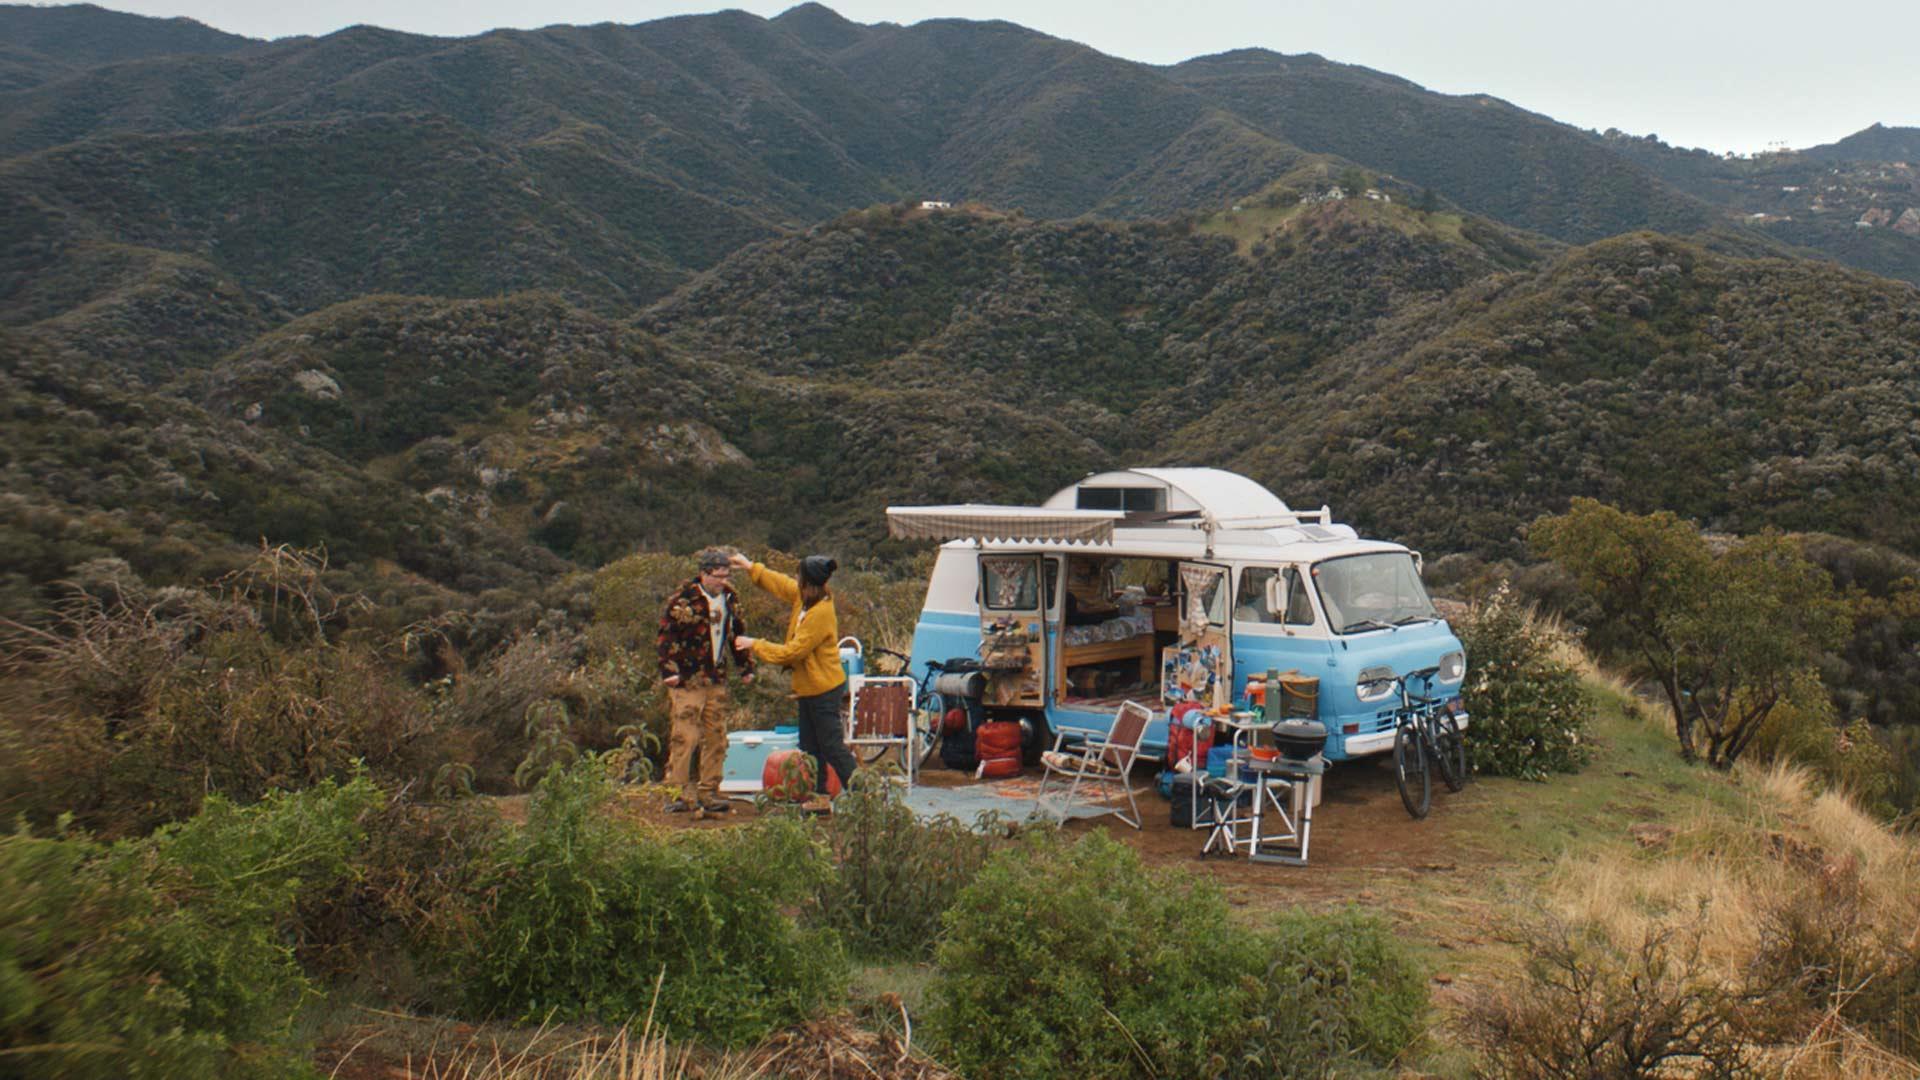 Jean & Gene's Awesome Adventure Road Trip: Season 3